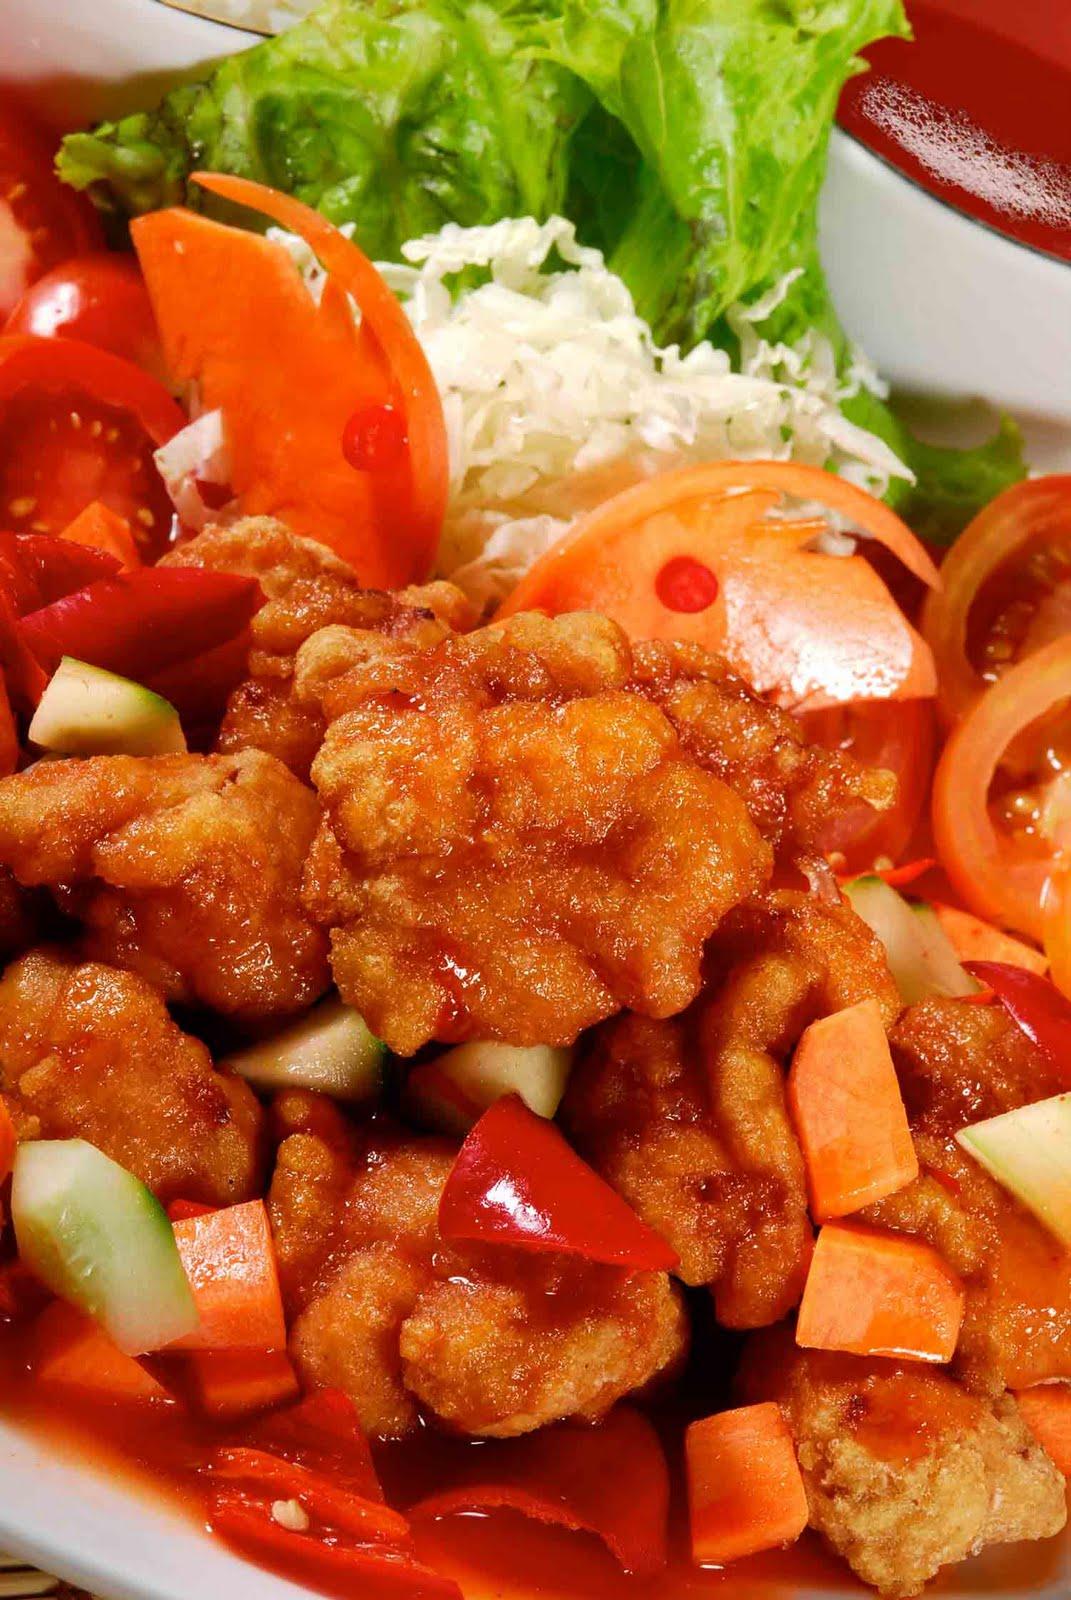 Resep Ayam Koloke : resep, koloke, Resep, Koloke:, Koloke